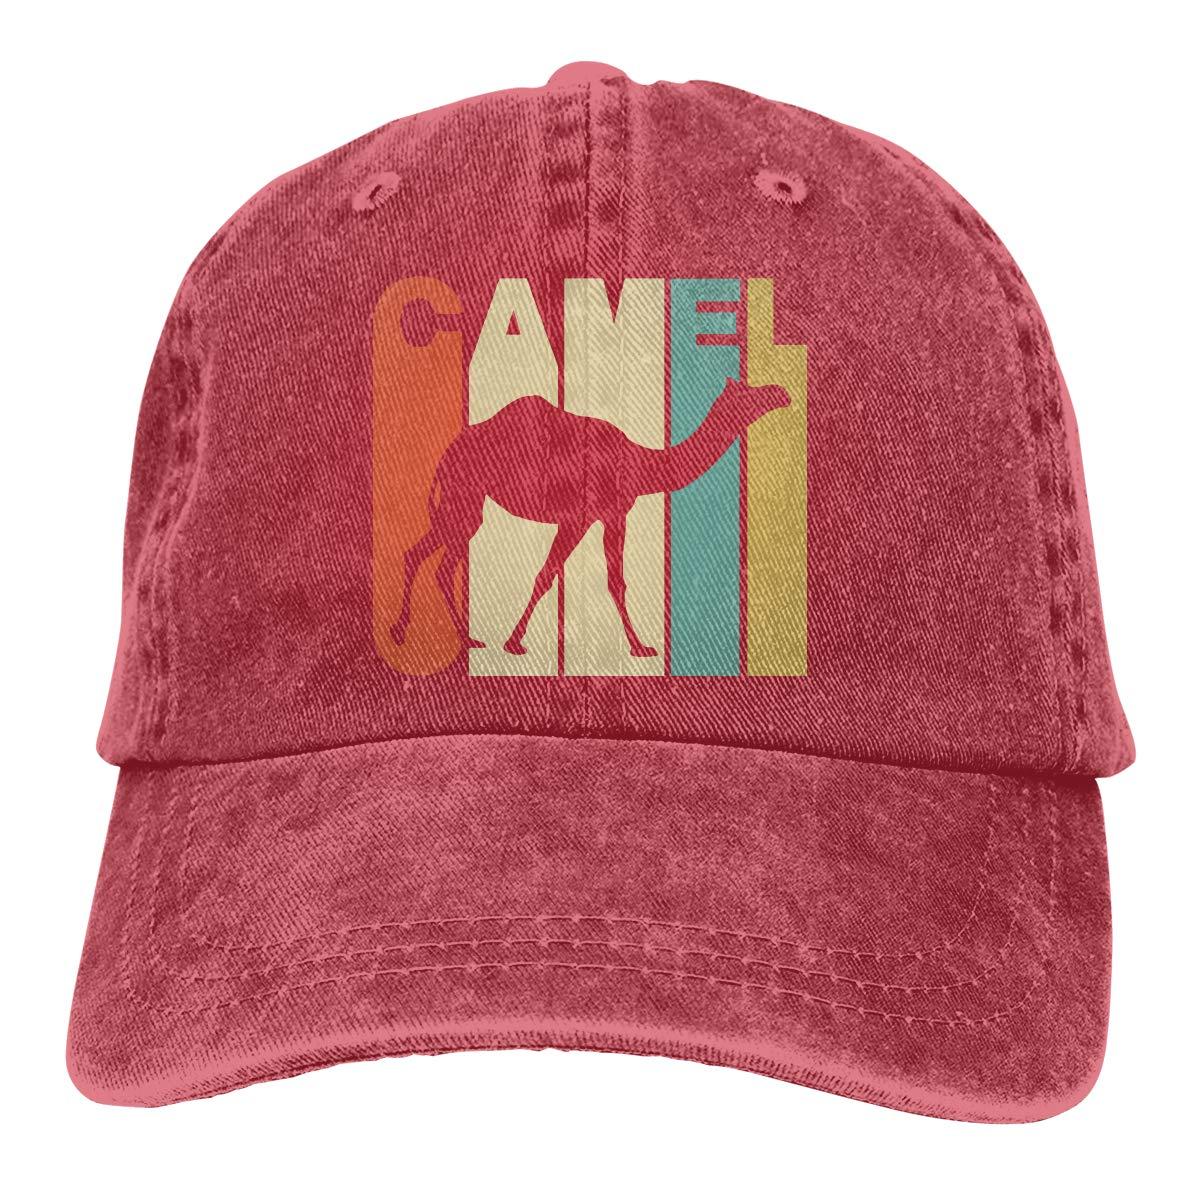 Vintage Style Camel Adult Custom Jeans Hip Hop Cap Adjustable Baseball Cap